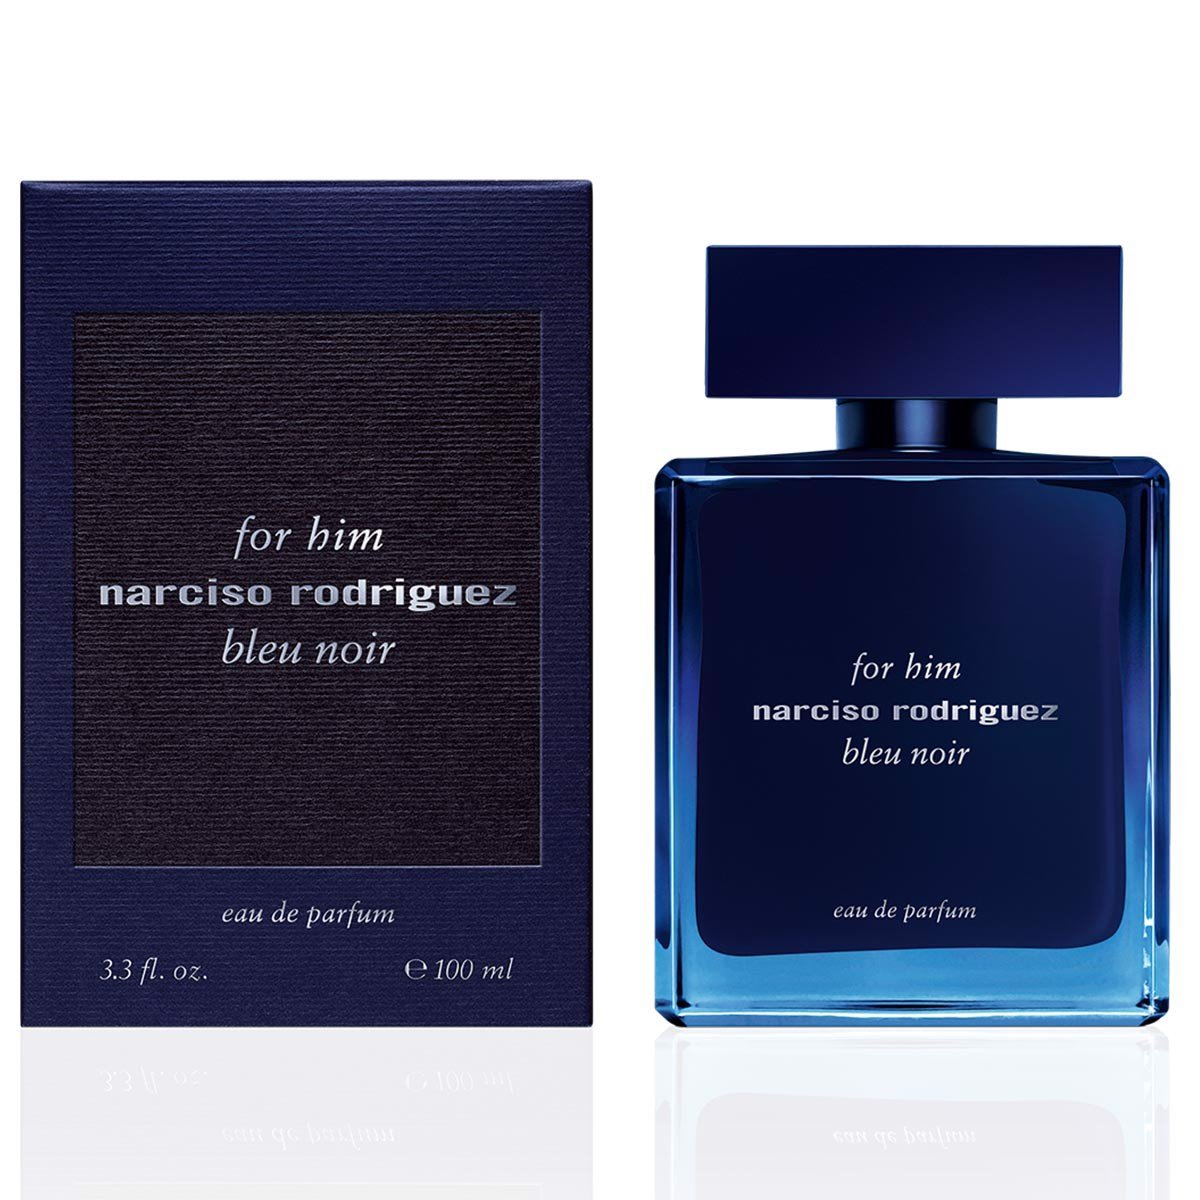 nuoc hoa narciso rodriguez for him bleu noir edp